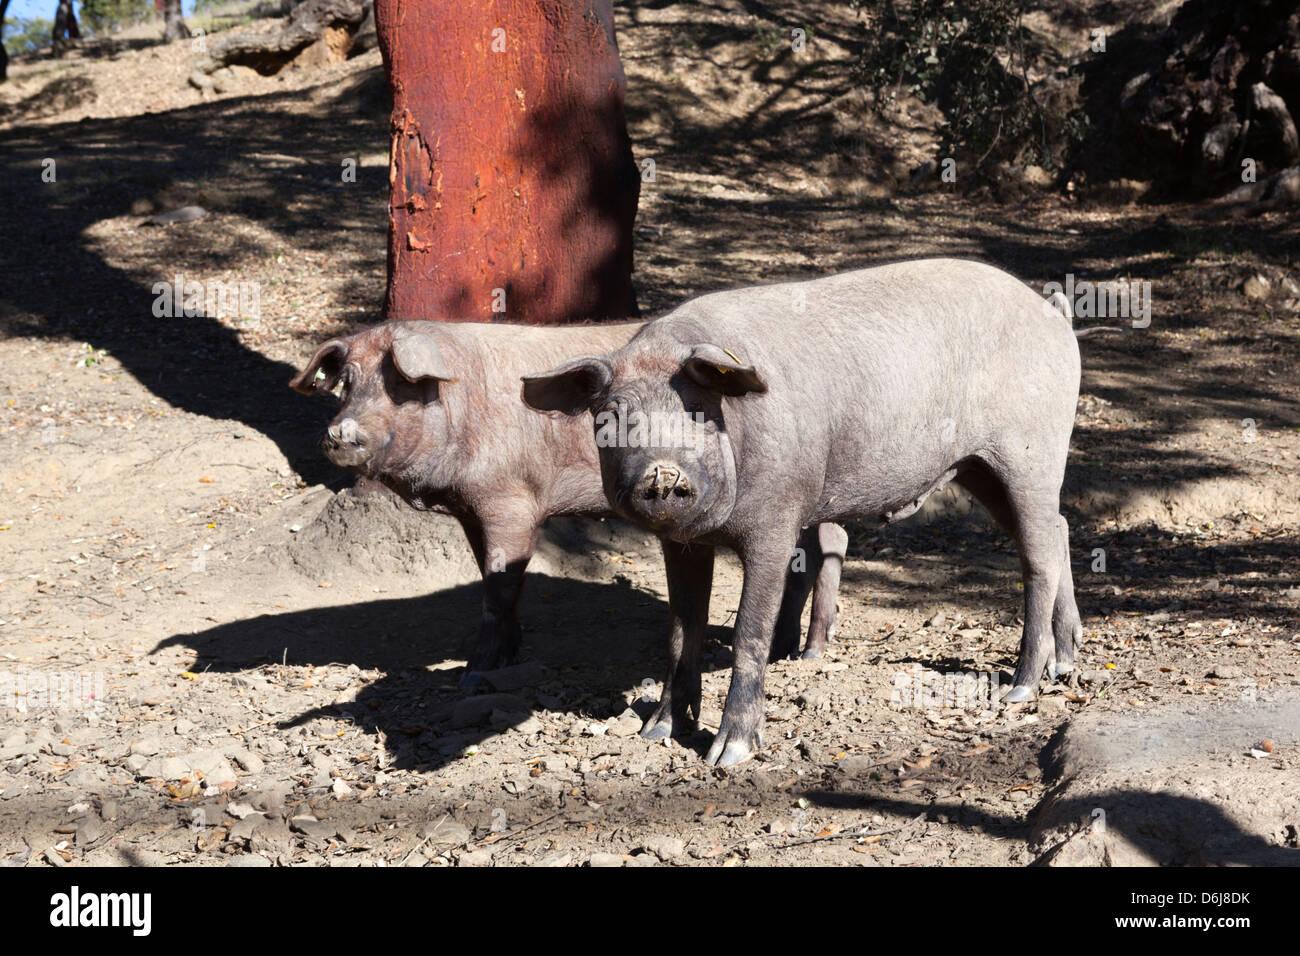 Iberian black pigs, Aracena, Sierra Morena, Huelva, Andalucia, Spain, Europe - Stock Image